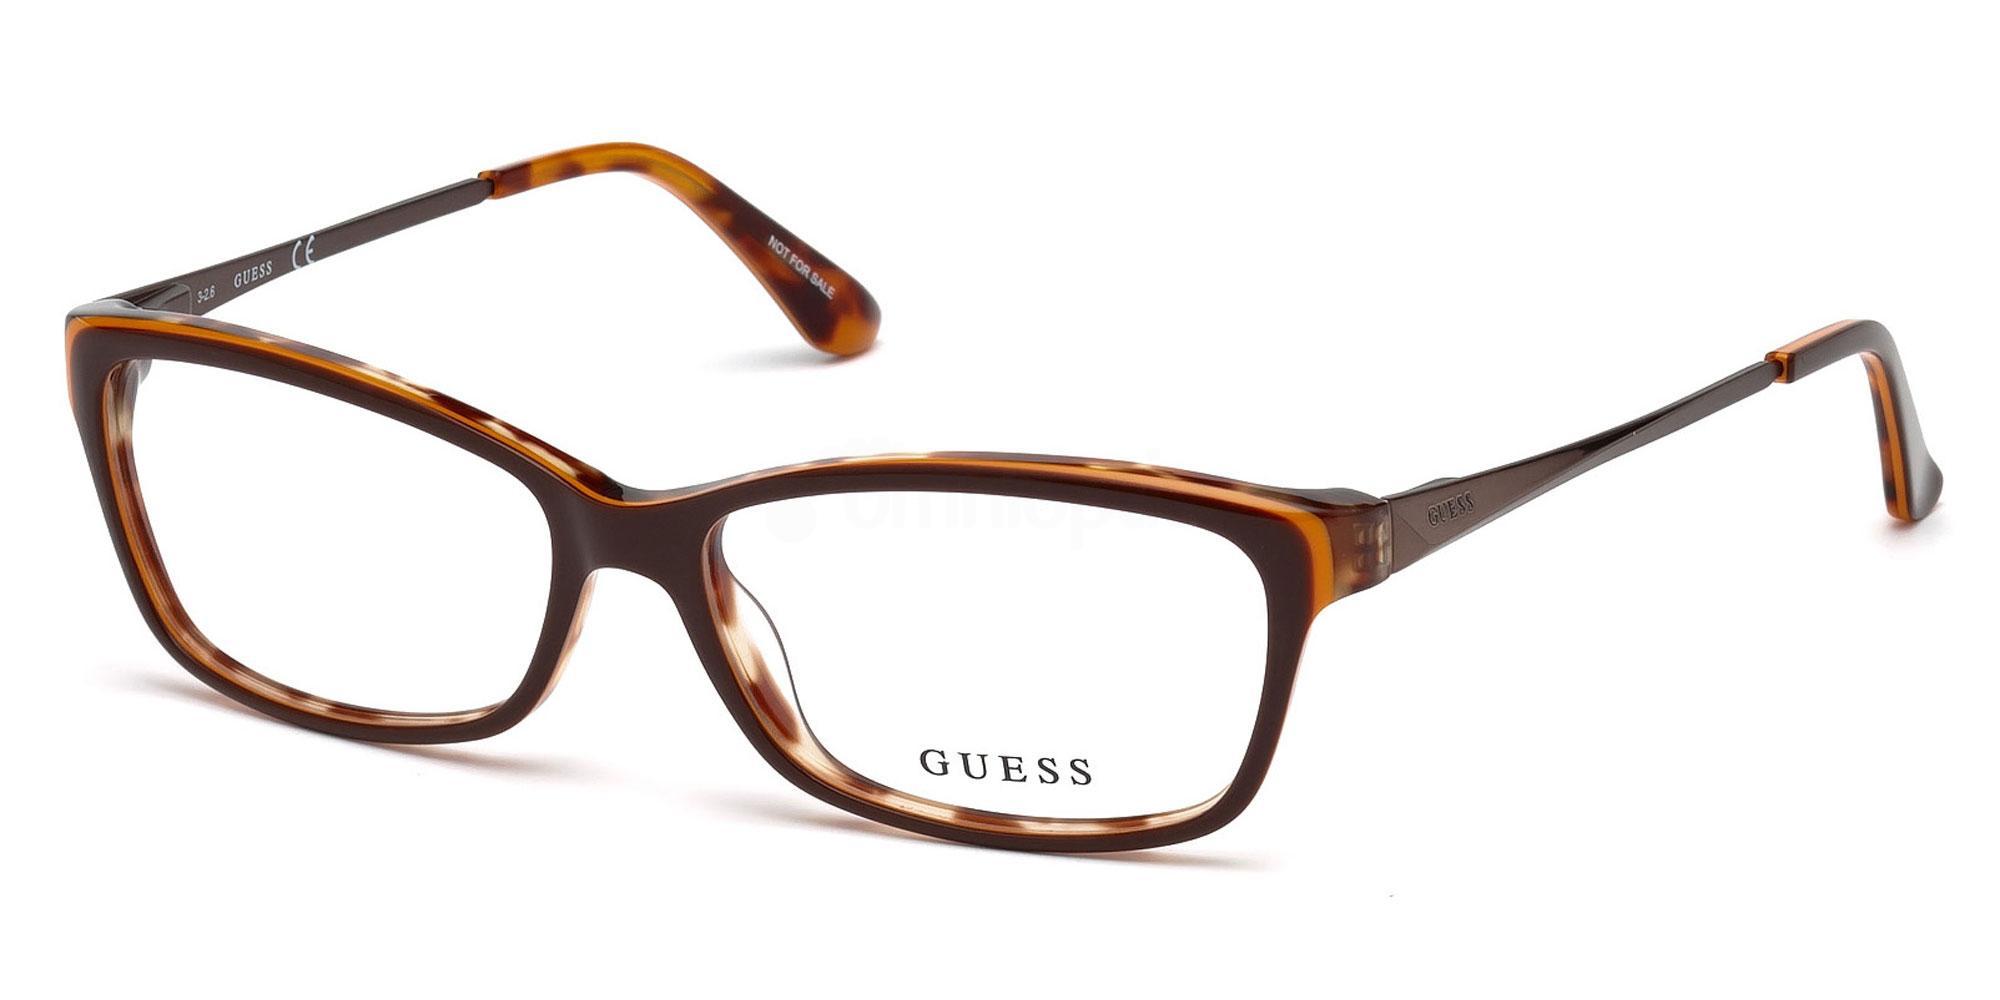 050 GU2635 , Guess